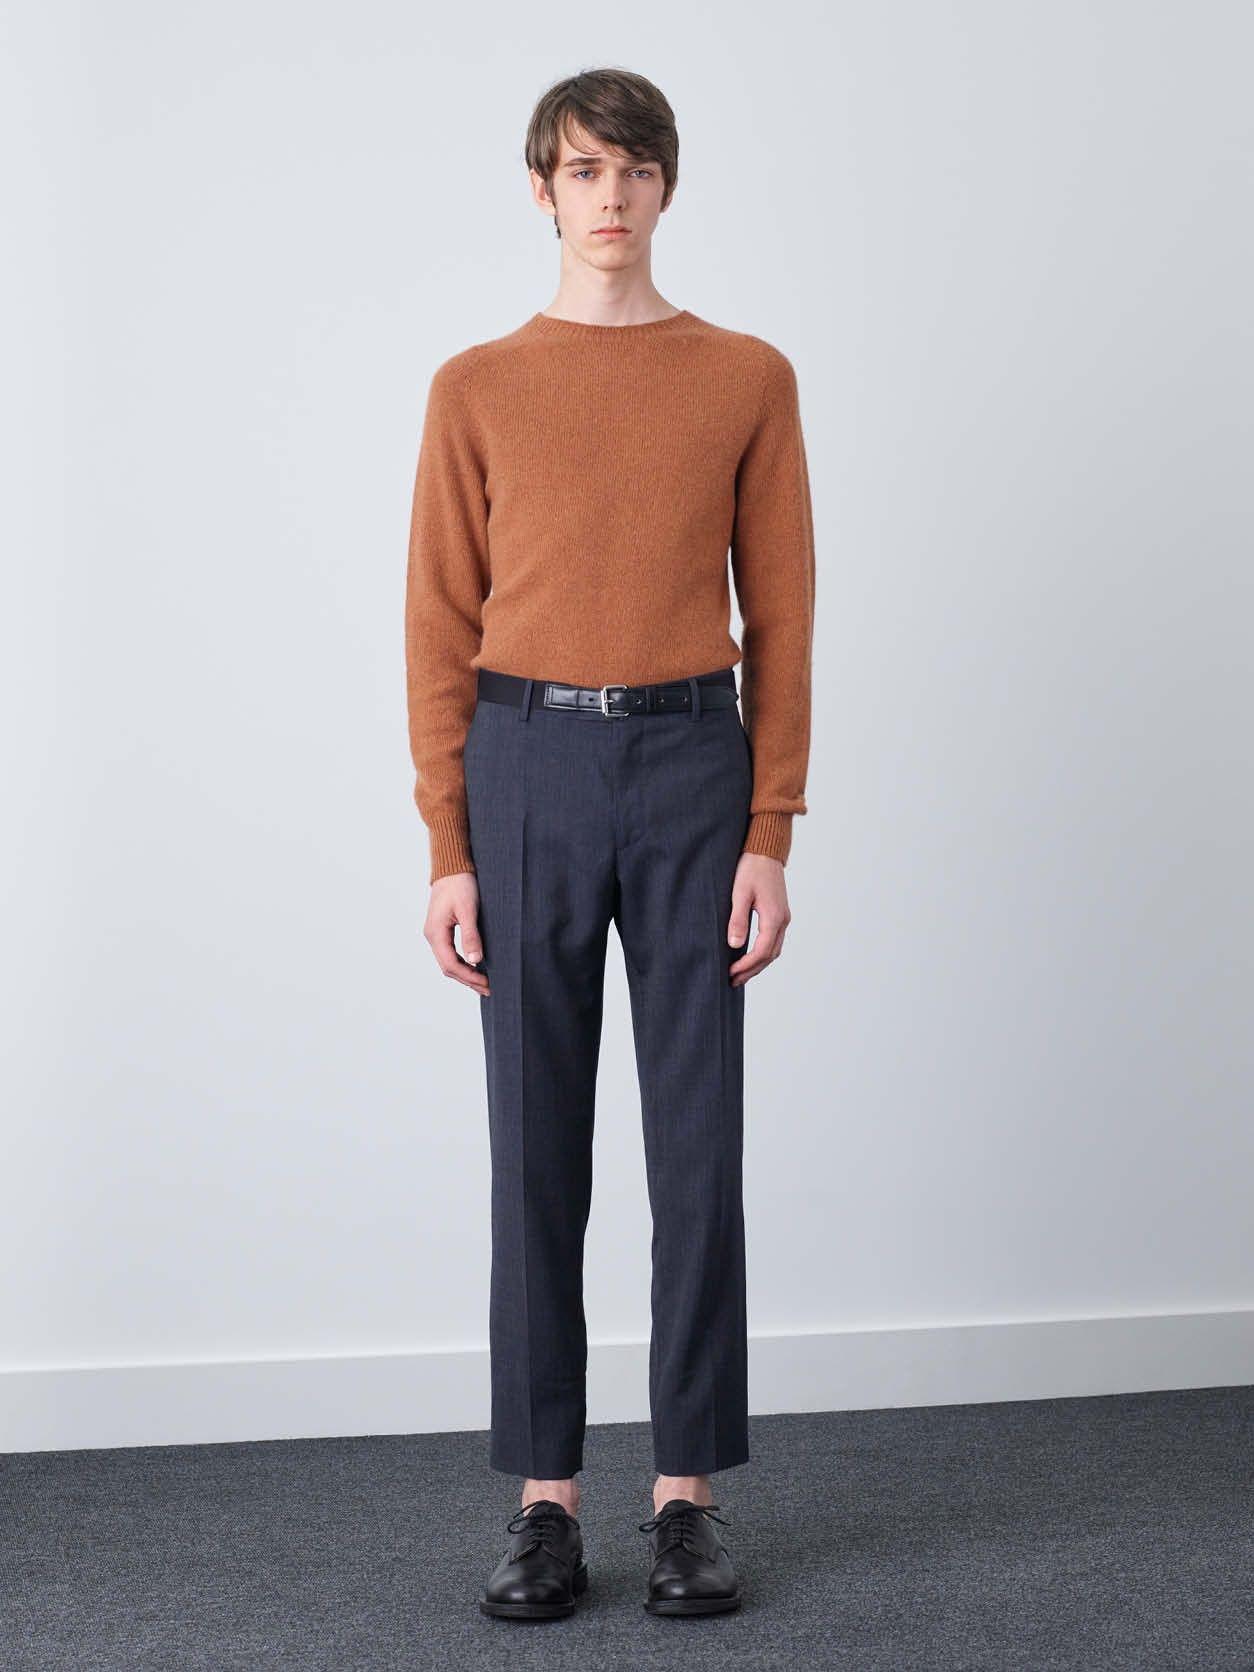 MARGARET HOWELL - SADDLE NECK CREW - Knitwear